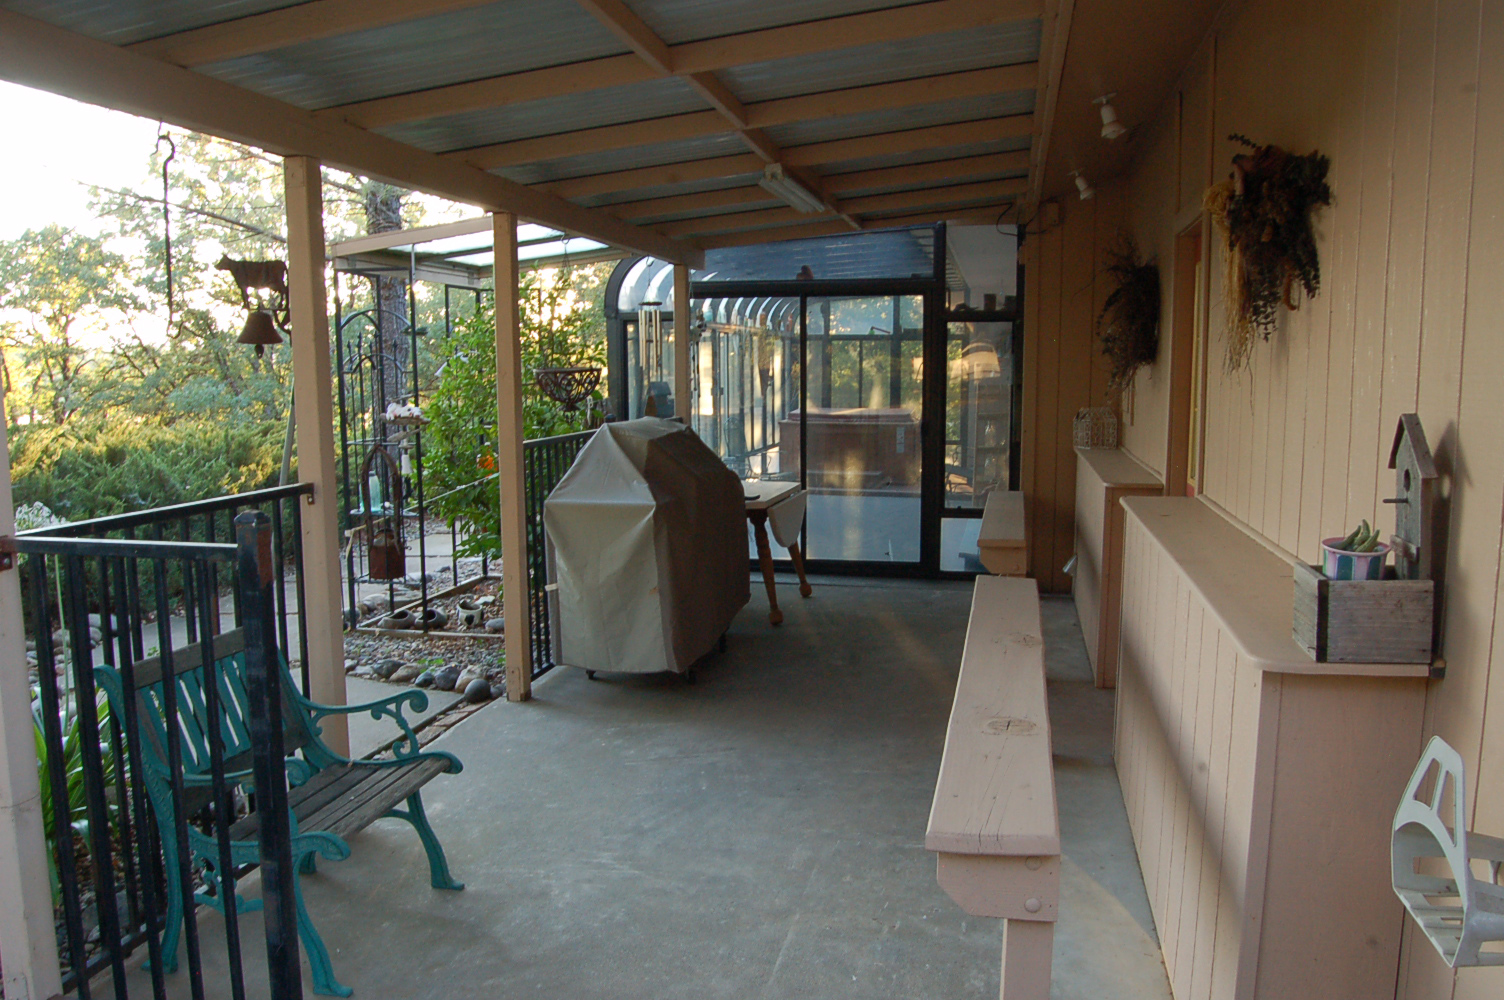 17410-Hooker-Creek-Rd-Cottonwood-CA-patio